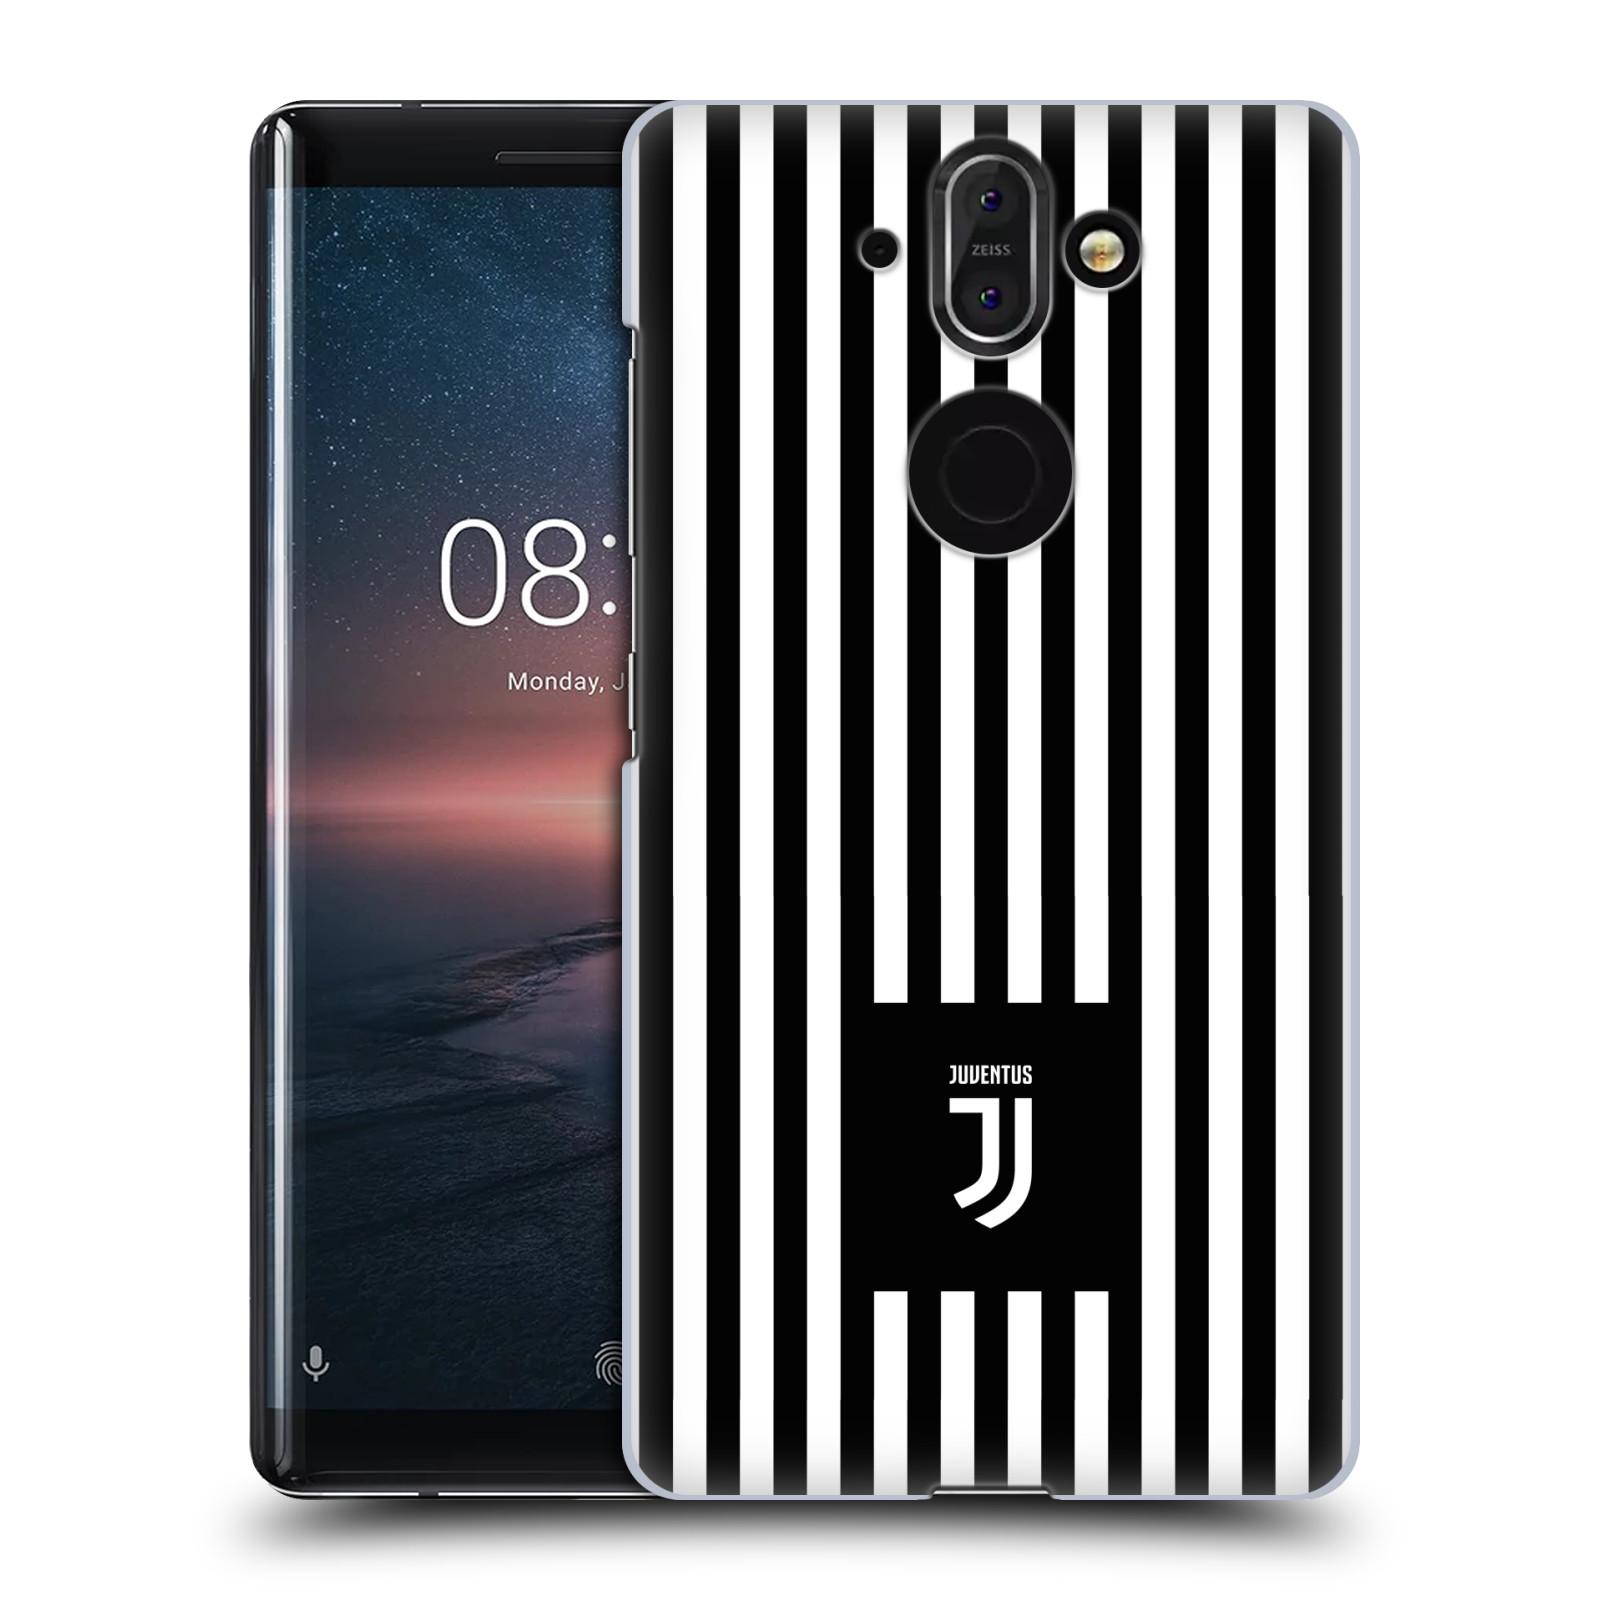 Plastové pouzdro na mobil Nokia 8 Sirocco - Head Case - Juventus FC - Nové logo - Pruhy